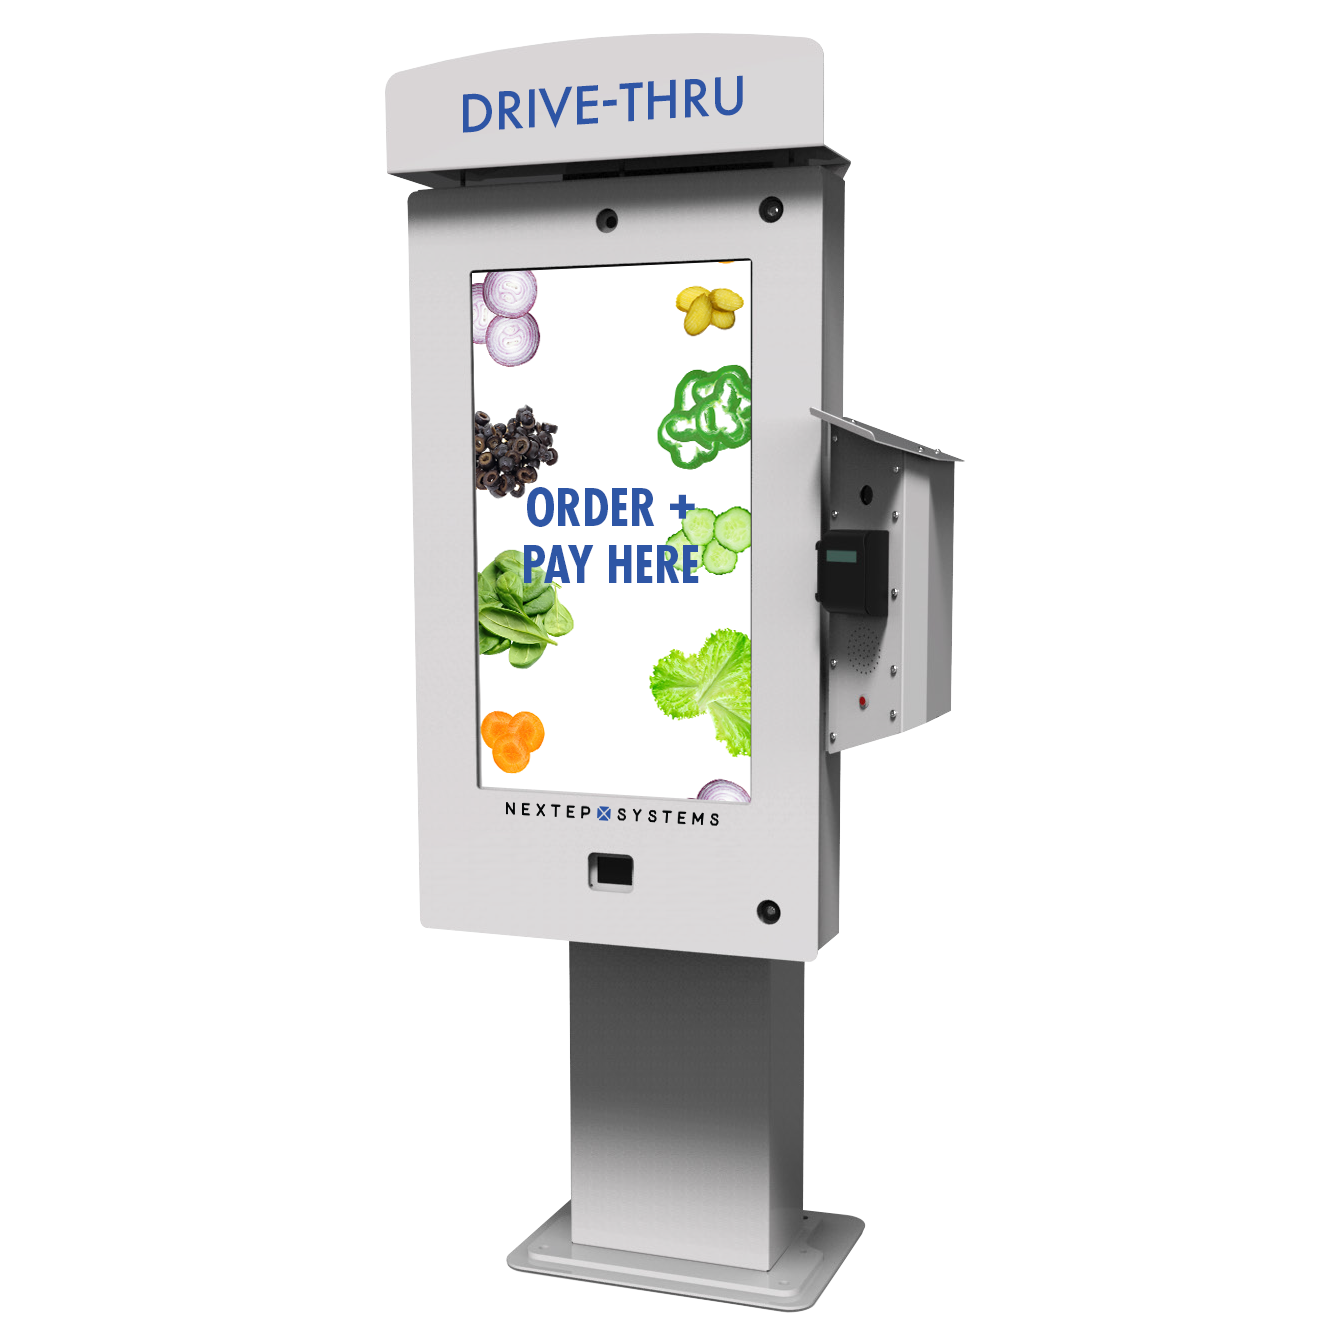 2. Test out our cutting-edge Touchscreen Drive-Thru. -